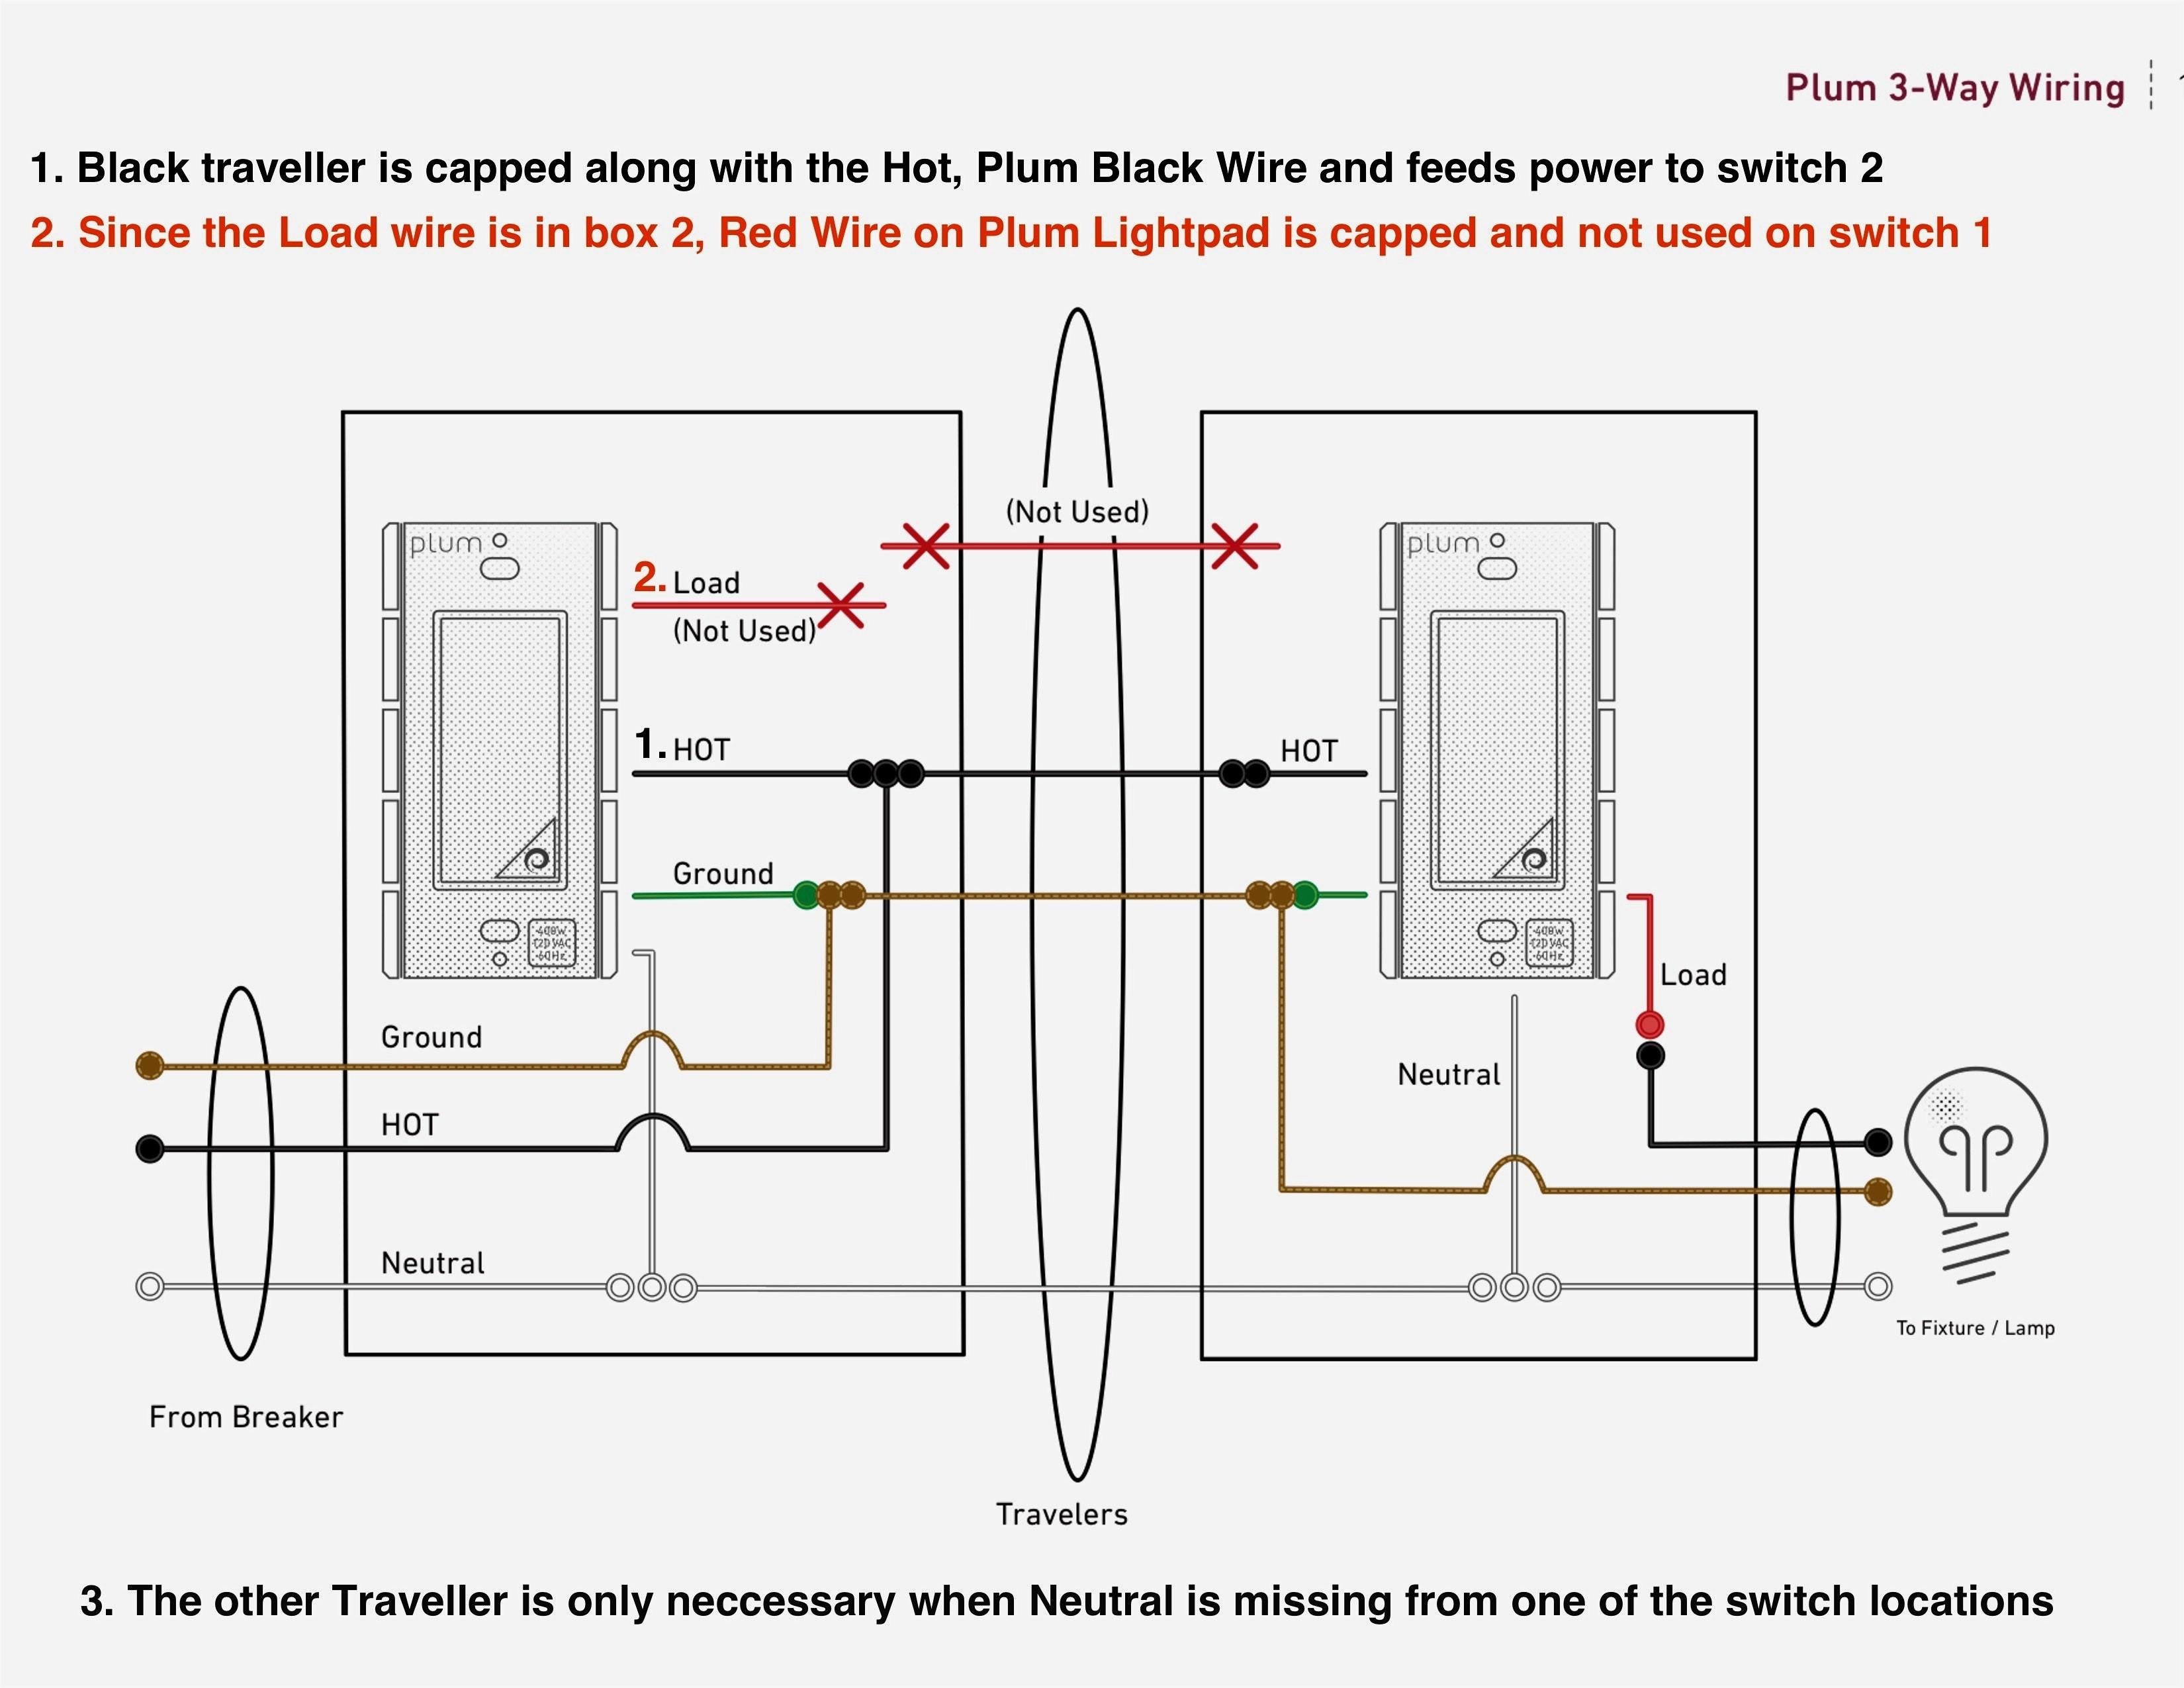 Leviton Decora 3 Way Switch Wiring Diagram 5603 Suzuki Apv Fuse Box Of Leviton Decora 3 Way Switch Wiring Diagram 5603